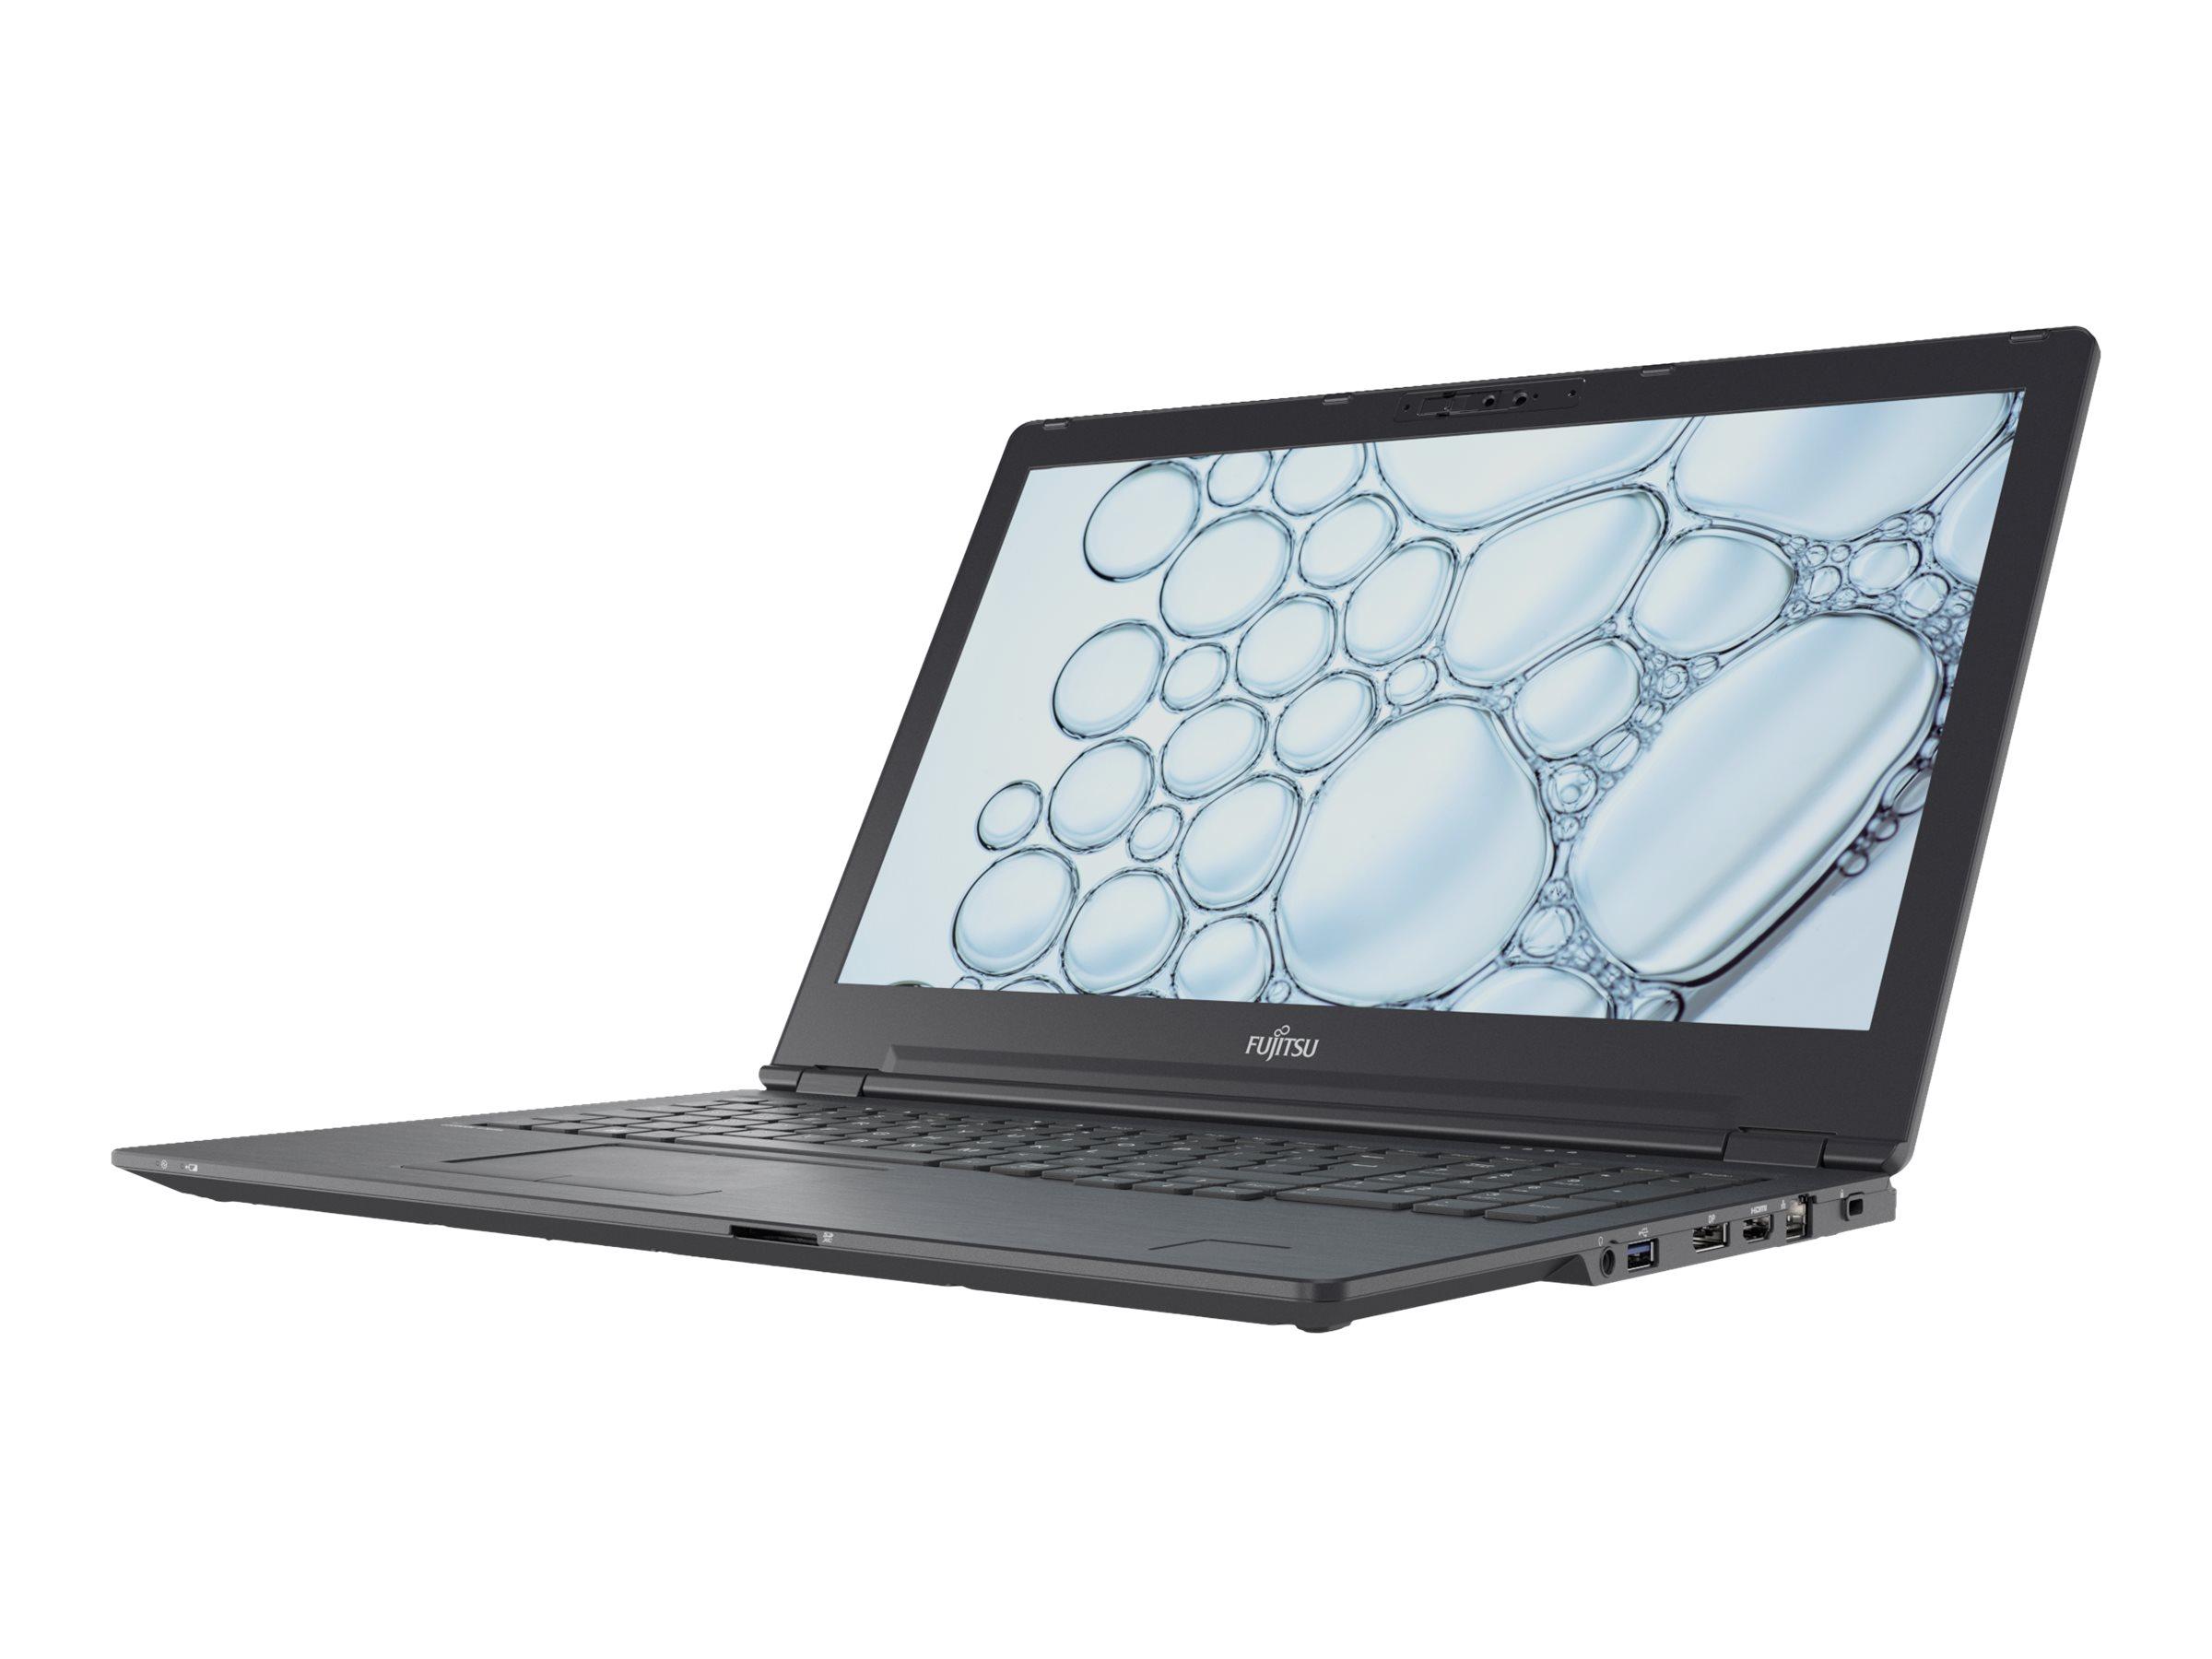 "Fujitsu LIFEBOOK U7510 - Ultrabook - Core i5 10210U / 1.6 GHz - Win 10 Pro - 8 GB RAM - 256 GB SSD NVMe, EraseDisk - 39.6 cm (15.6"")"